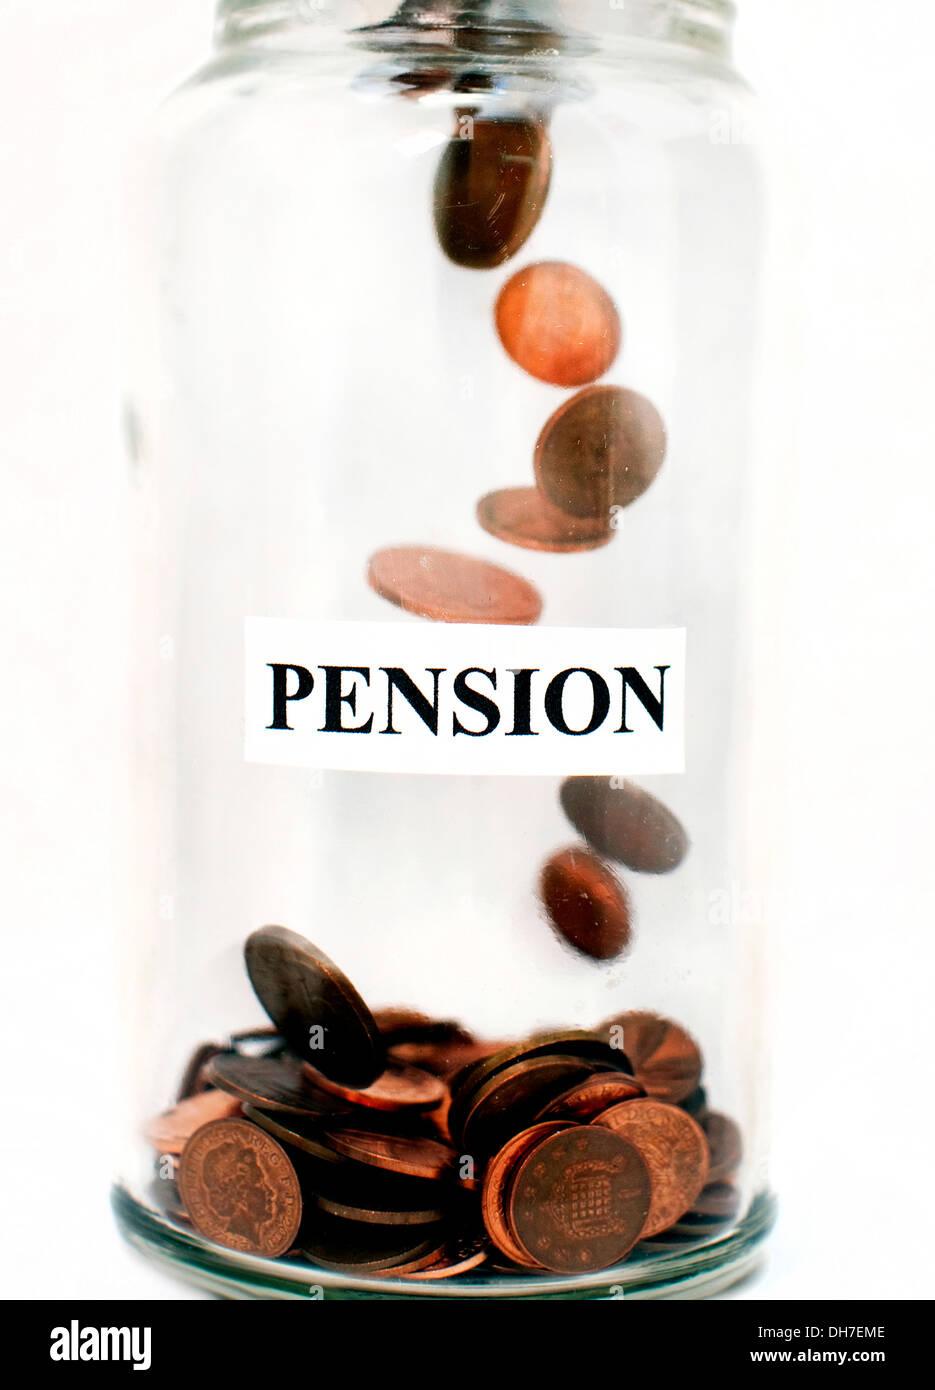 Illustration of money filling a pension pot, London - Stock Image